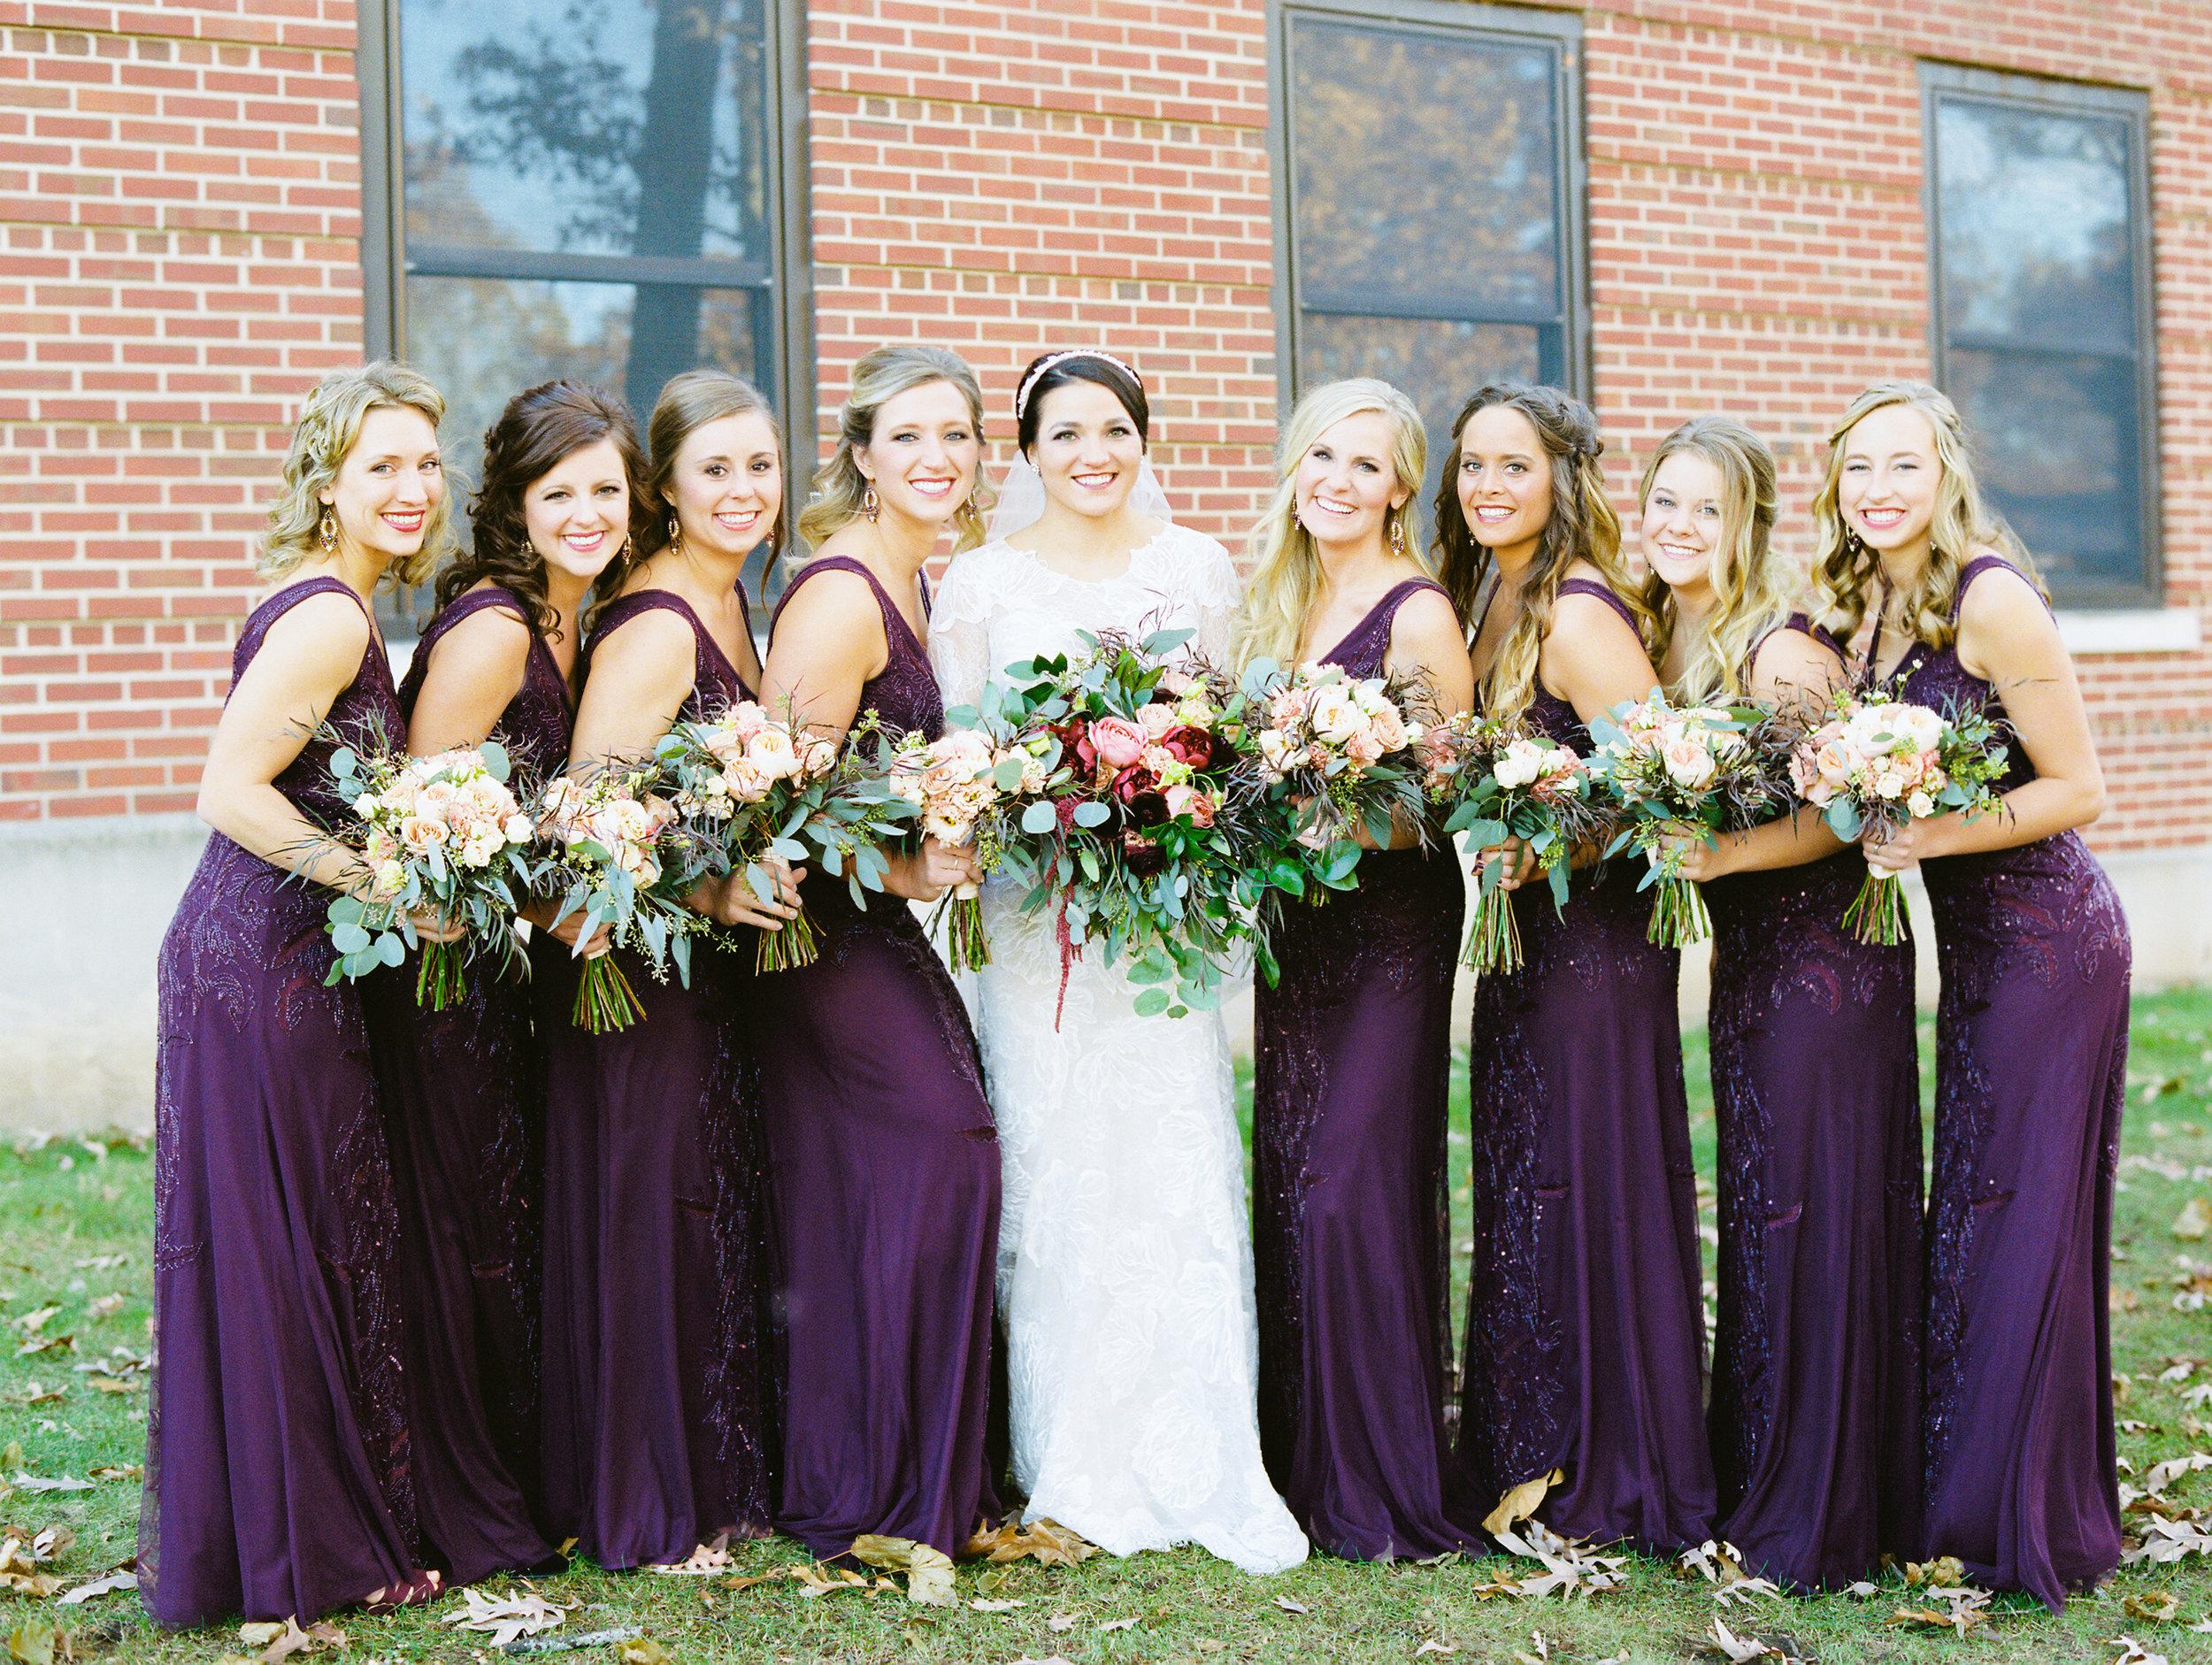 Vogelzang+Wedding+Bridesmaids-32.jpg